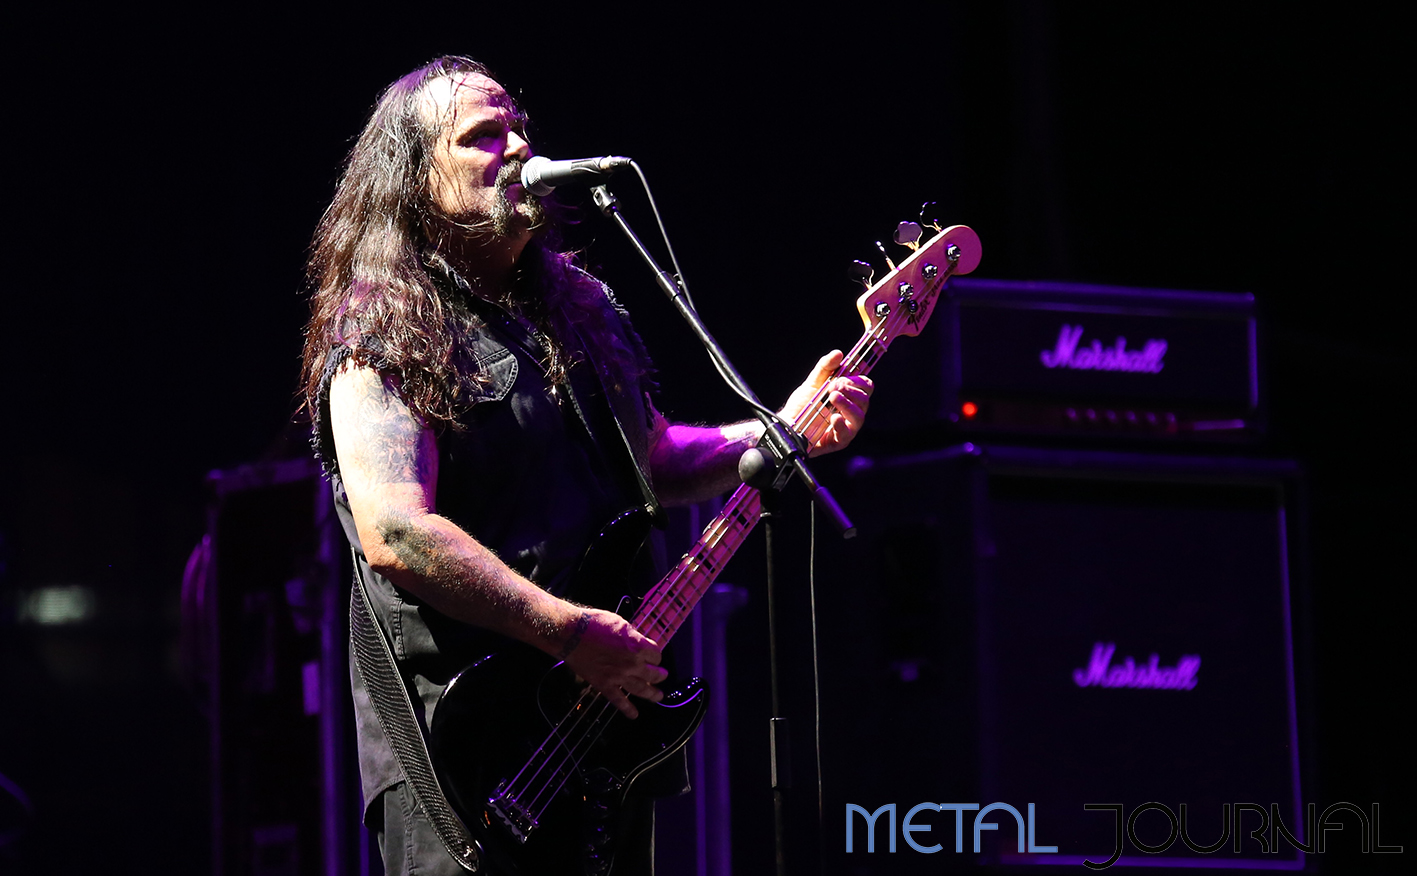 deicide - leyendas del rock 2019 metal journal pic 1